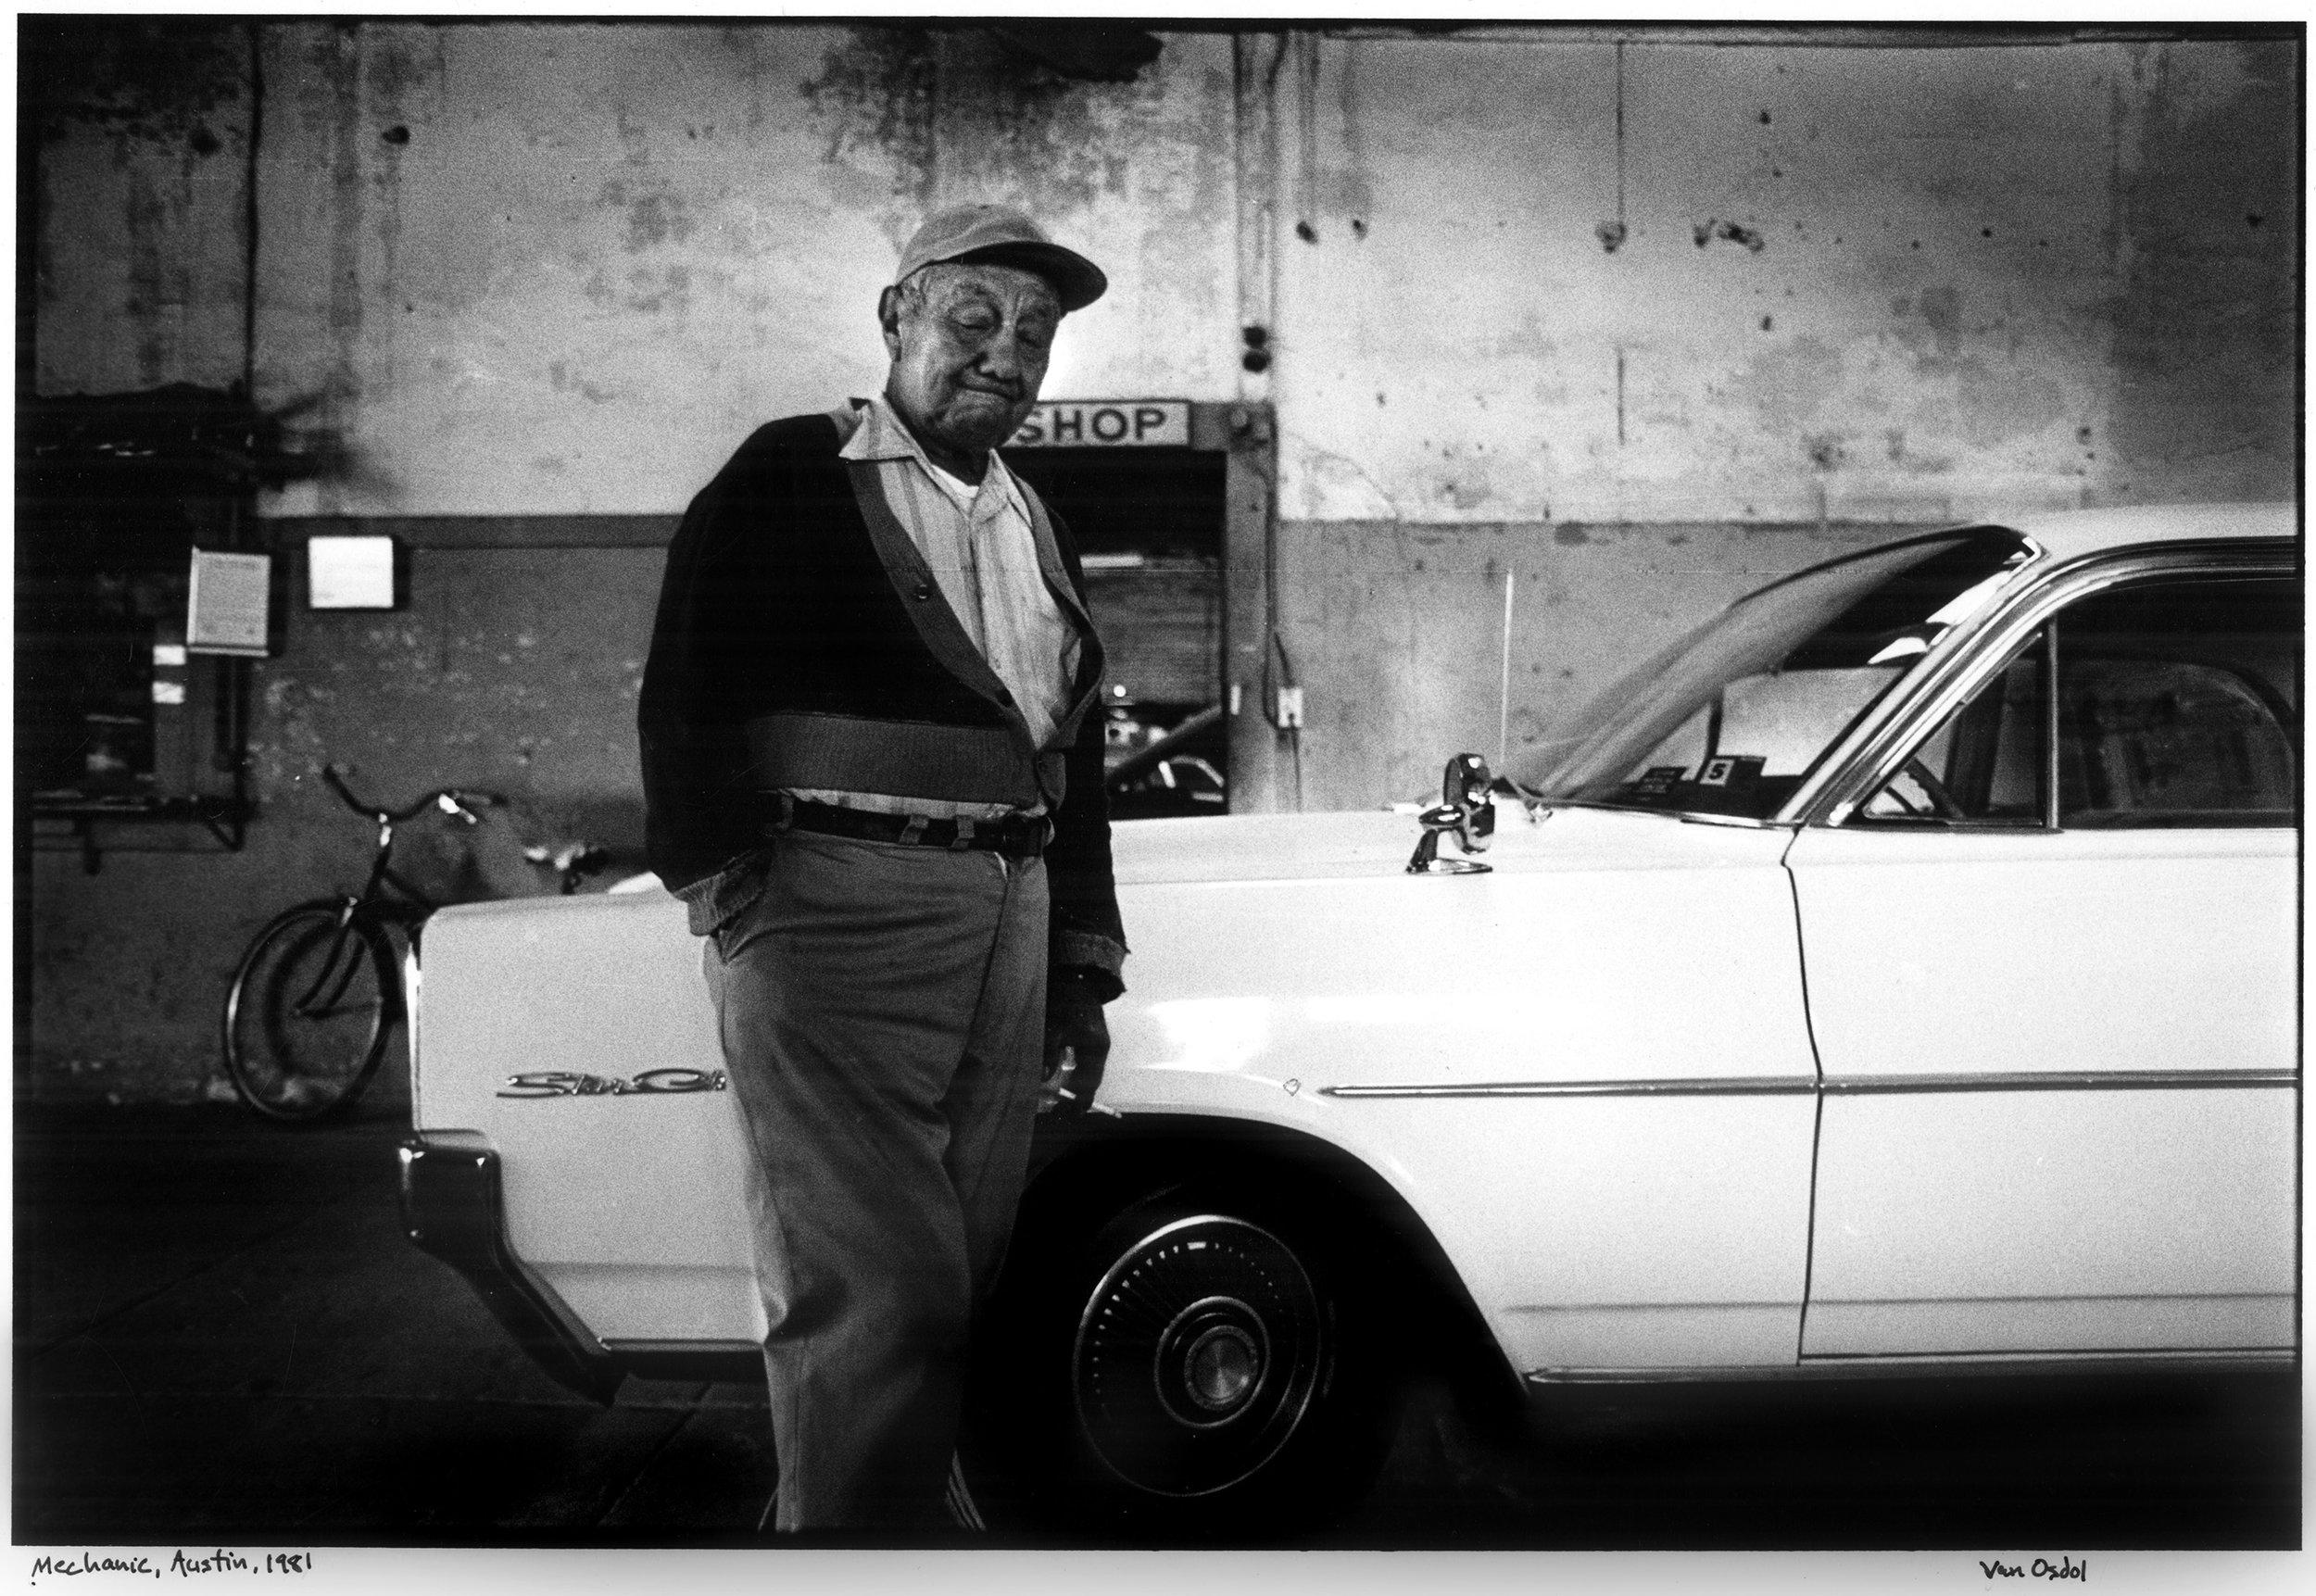 Mechanic, 6th & Trinity, Austin, 1981